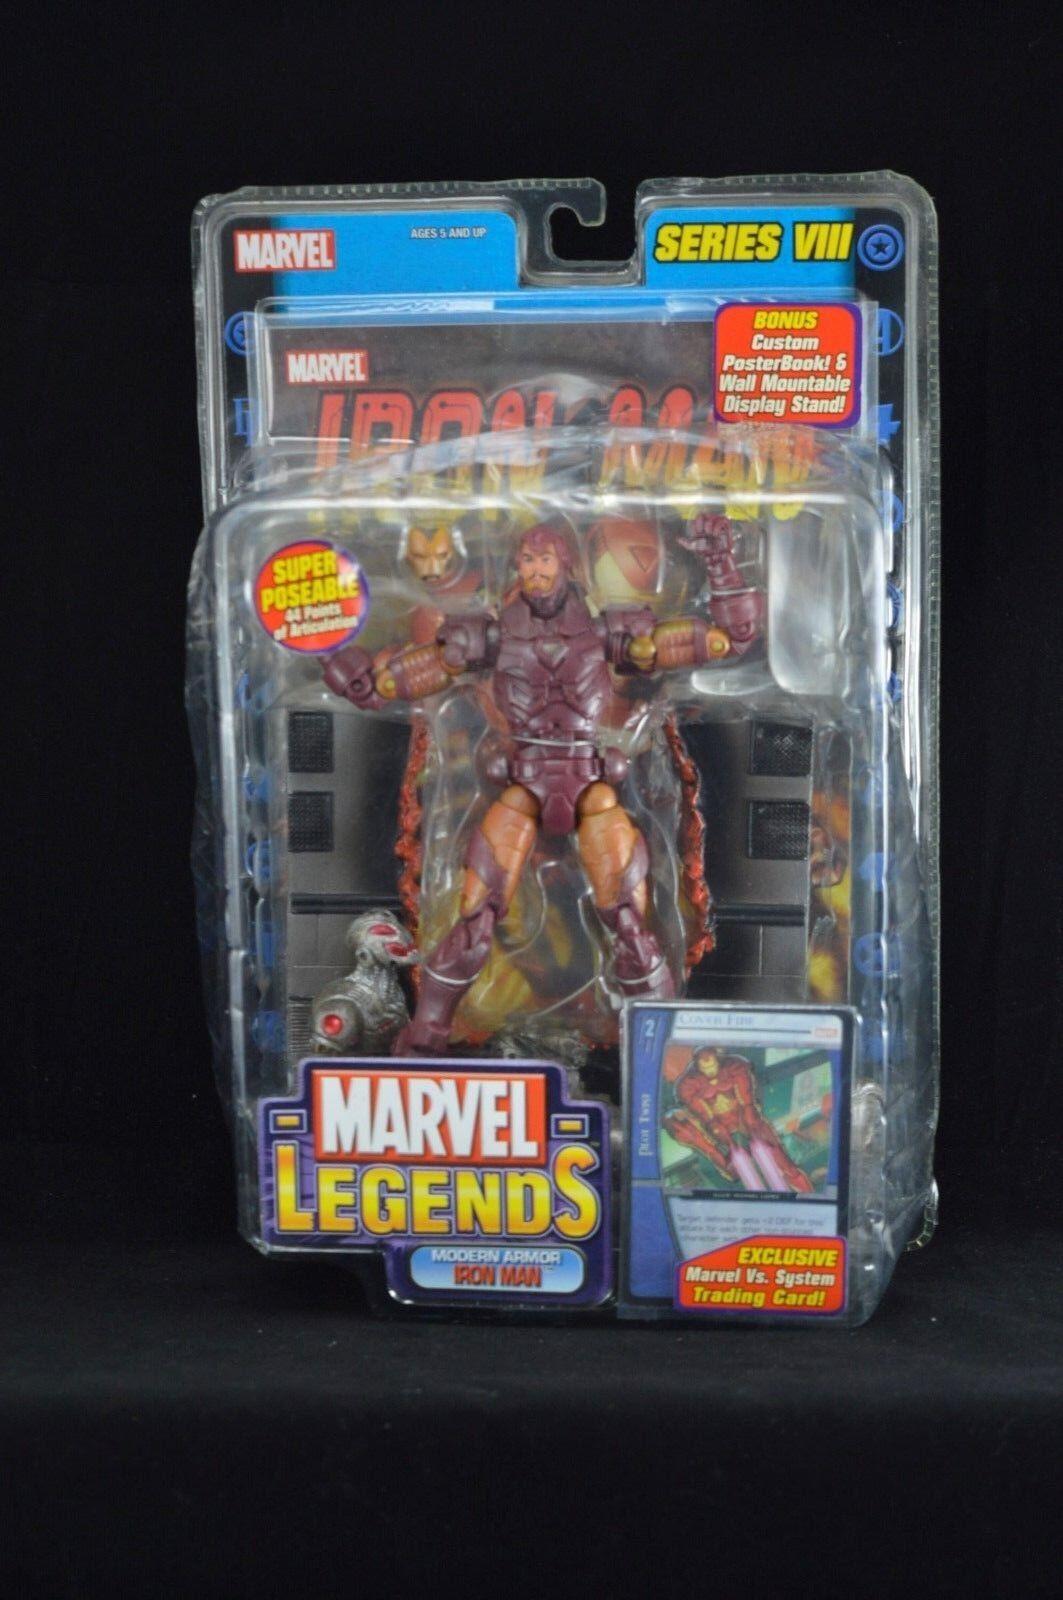 Marvel Legends Series VIII MODERN ARMOR IRON MAN MAN MAN New  Avengers Rare  e0b2cb